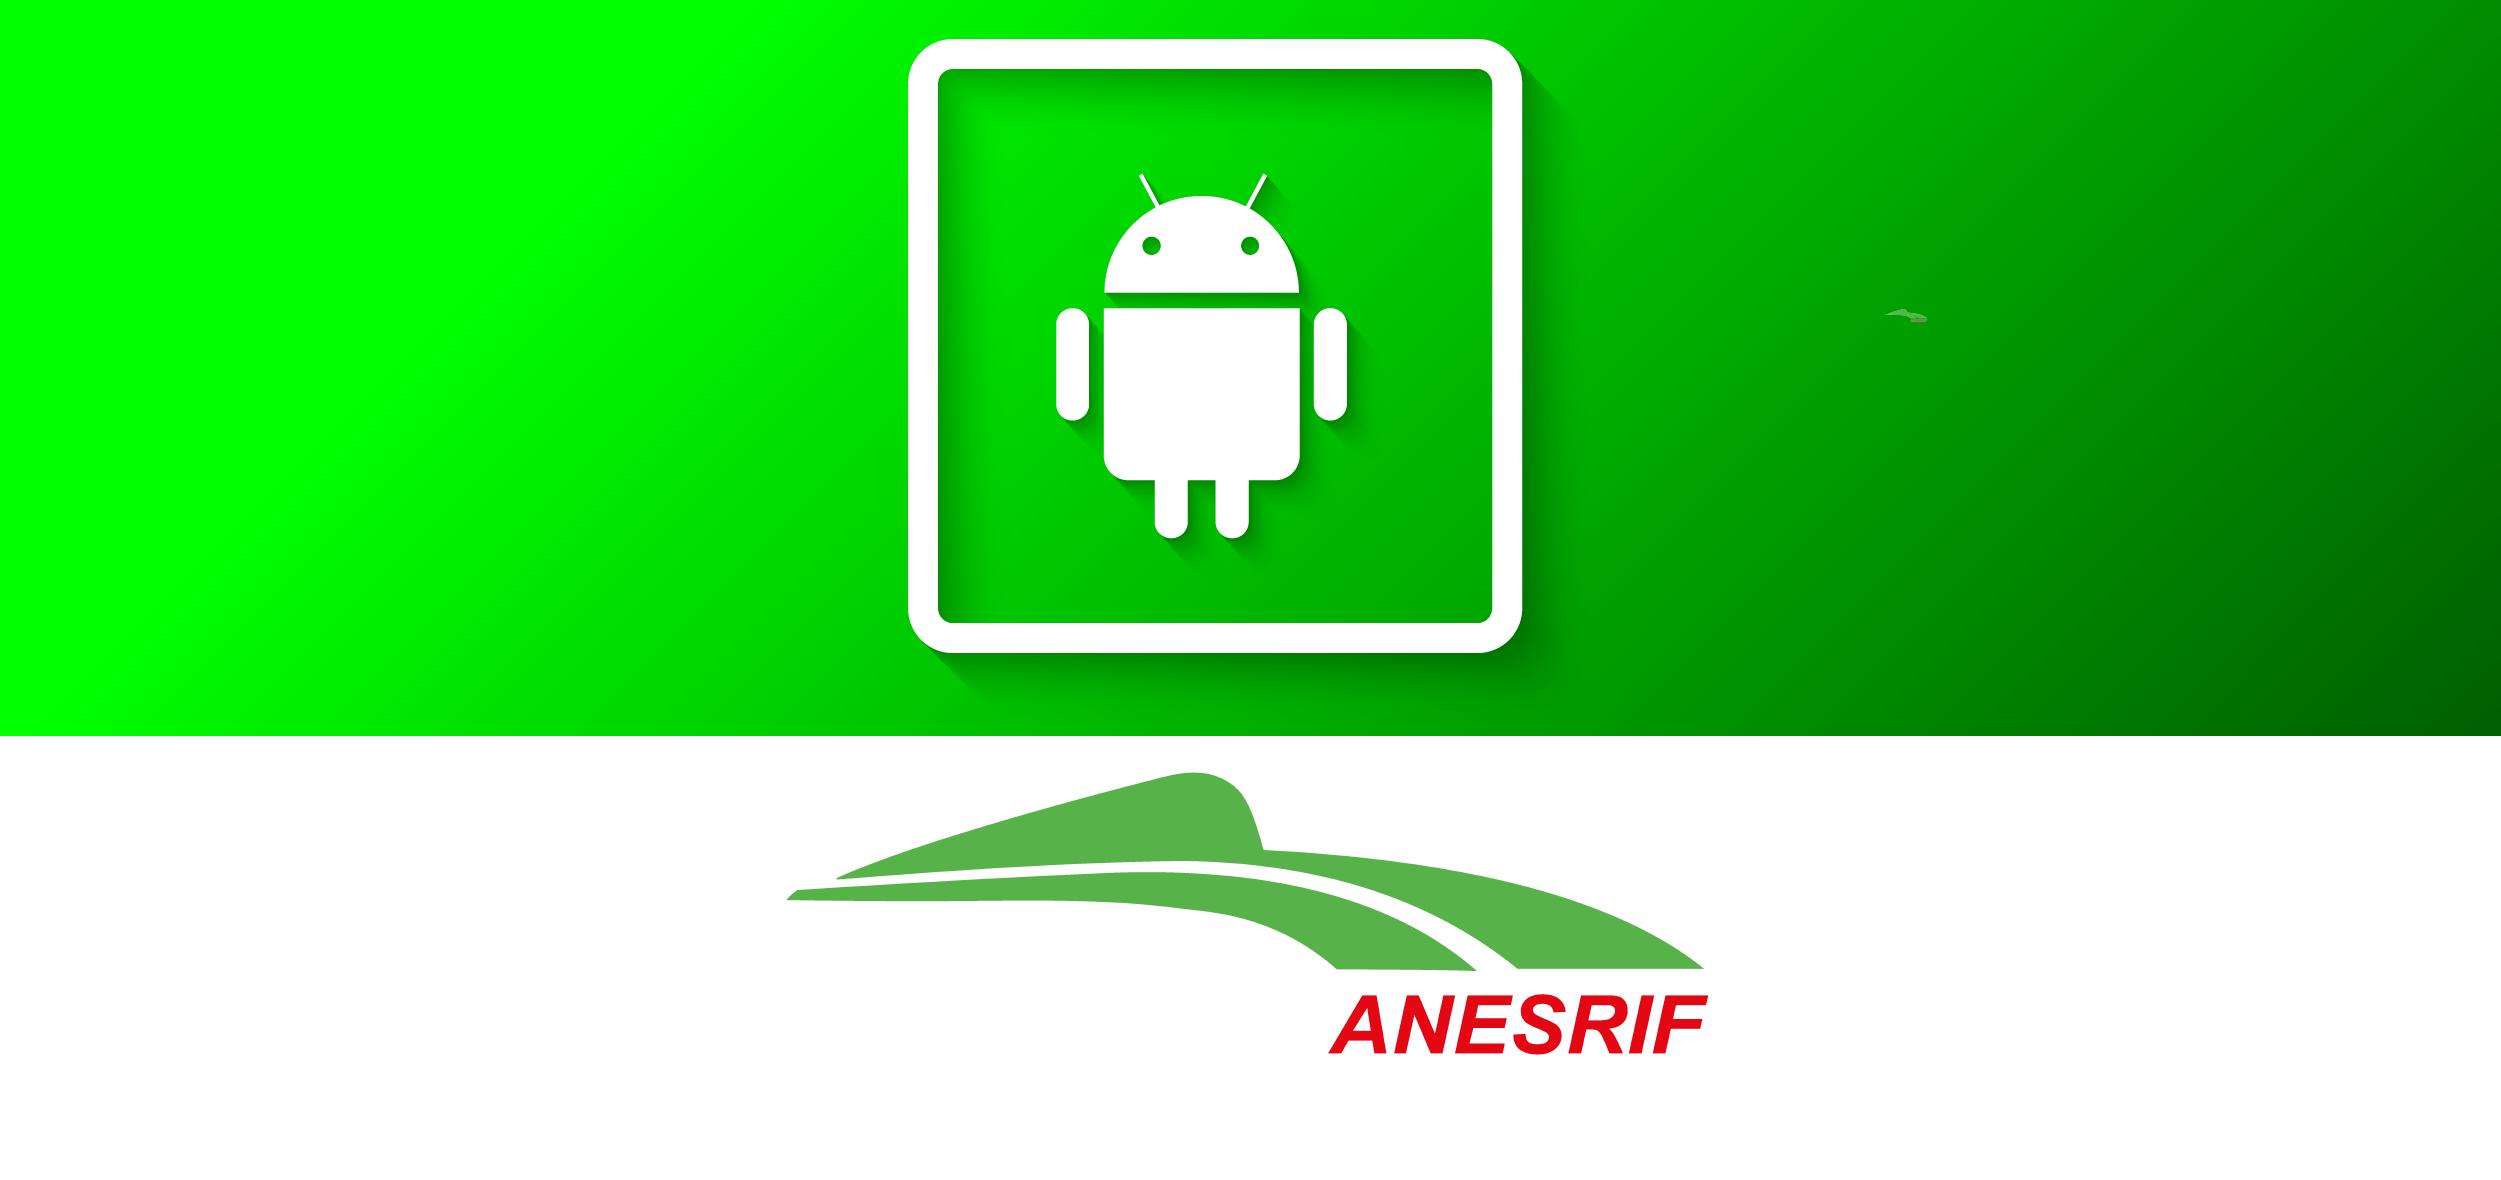 Télecharger Notre Application Android